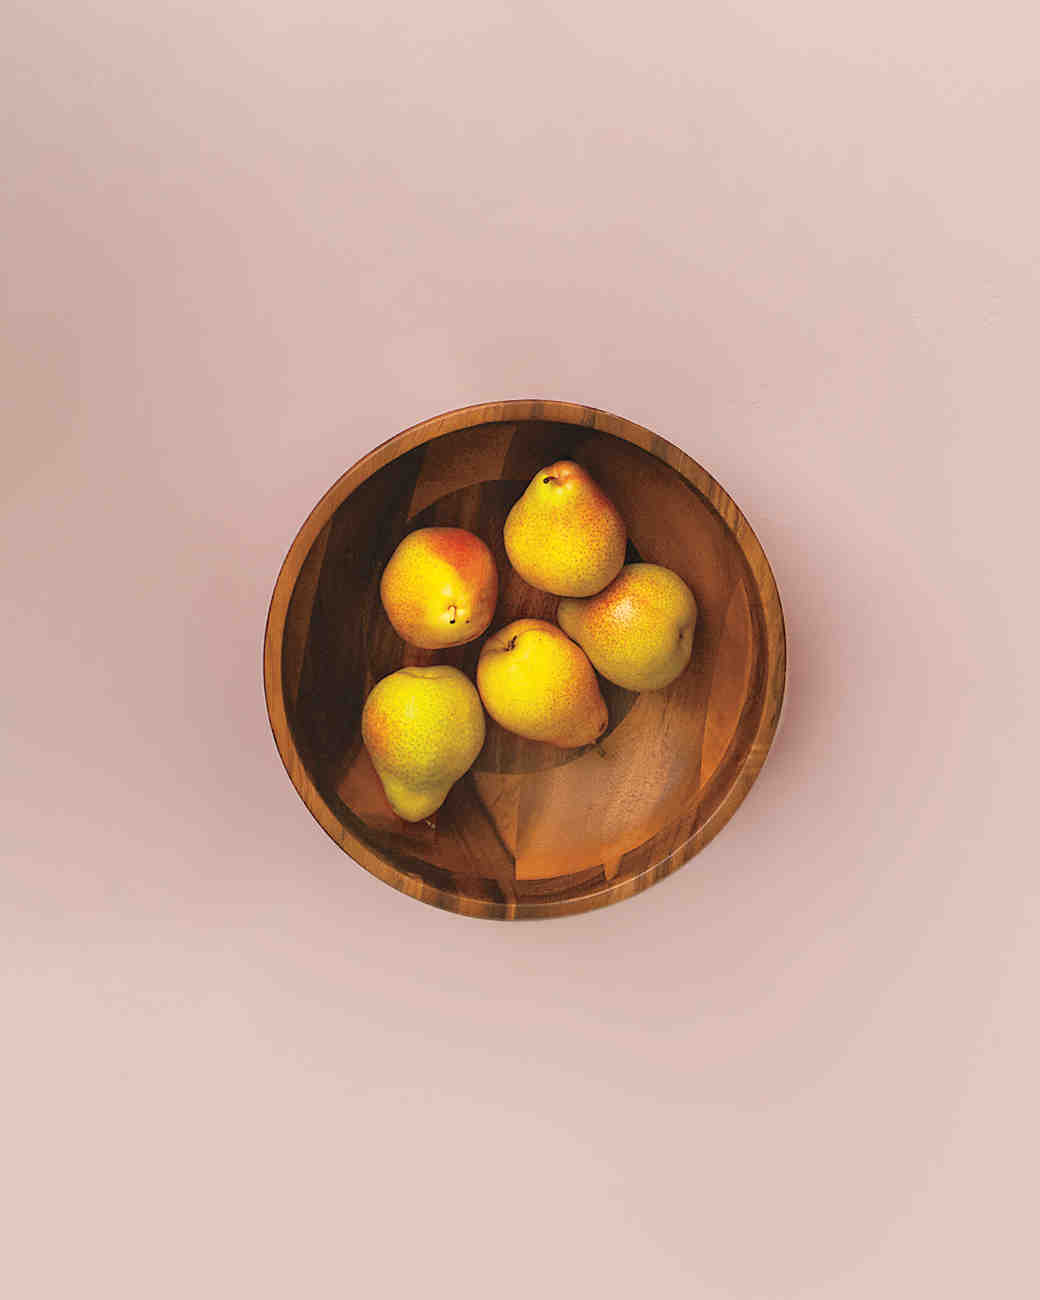 claire-pettibone-pears-mwd108878.jpg